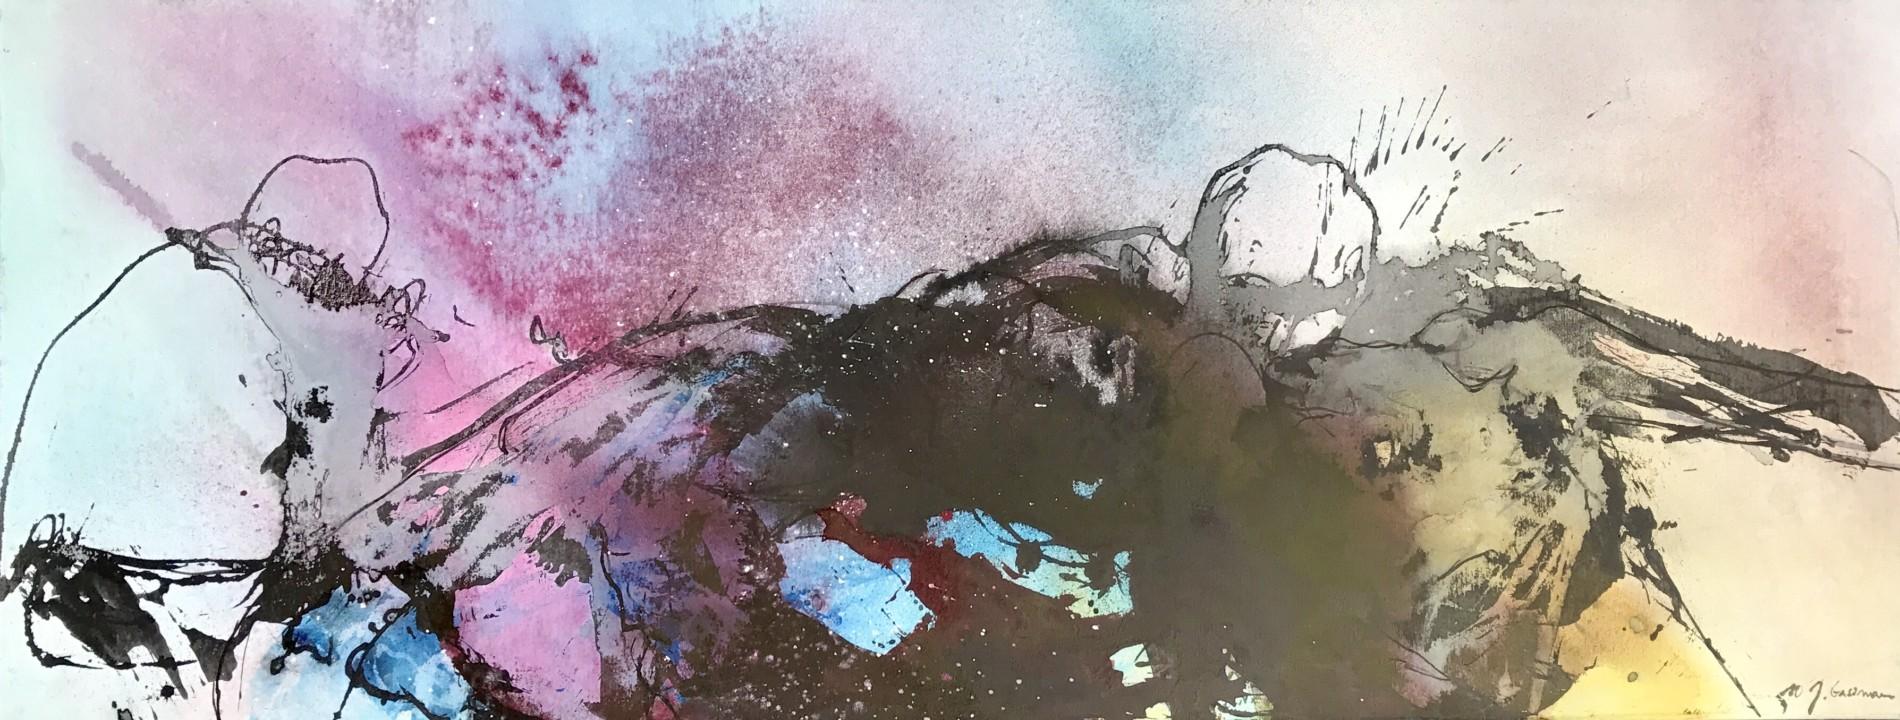 APART OF ME : figures colourfog, (2010)70 x 180 cm (28 x 71 inch)